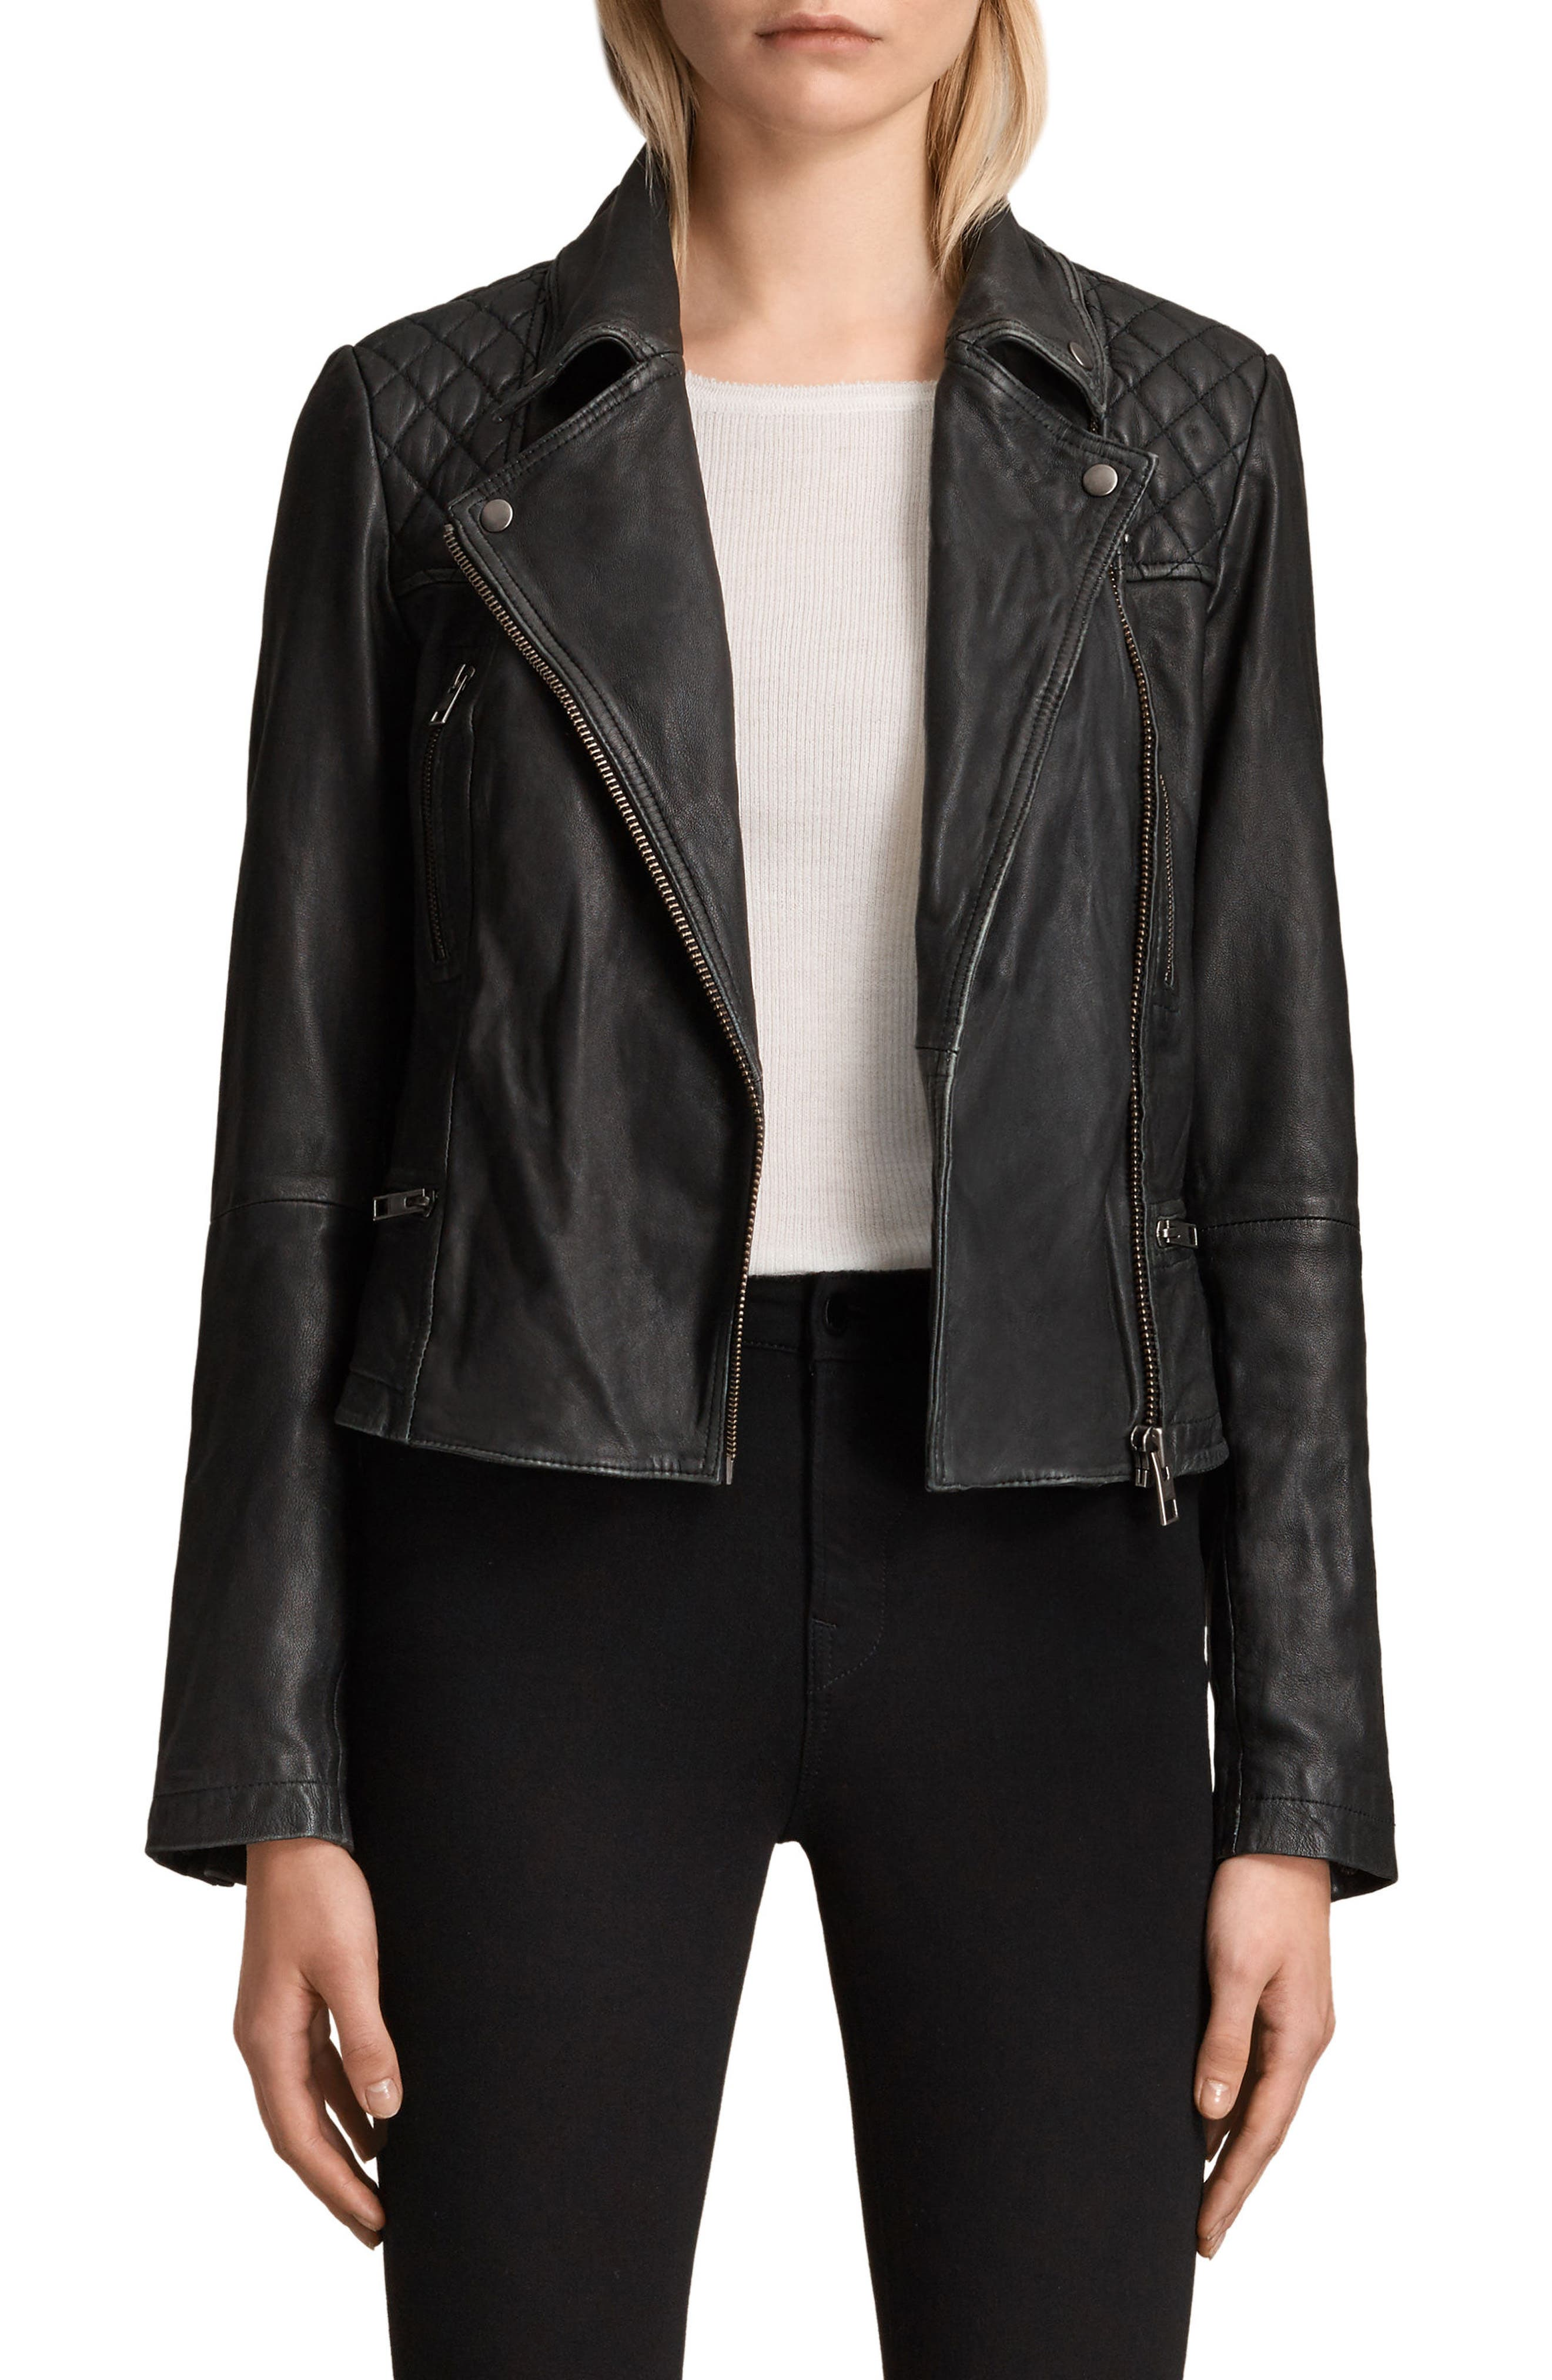 Cargo Leather Biker Jacket,                             Main thumbnail 1, color,                             Black/ Grey